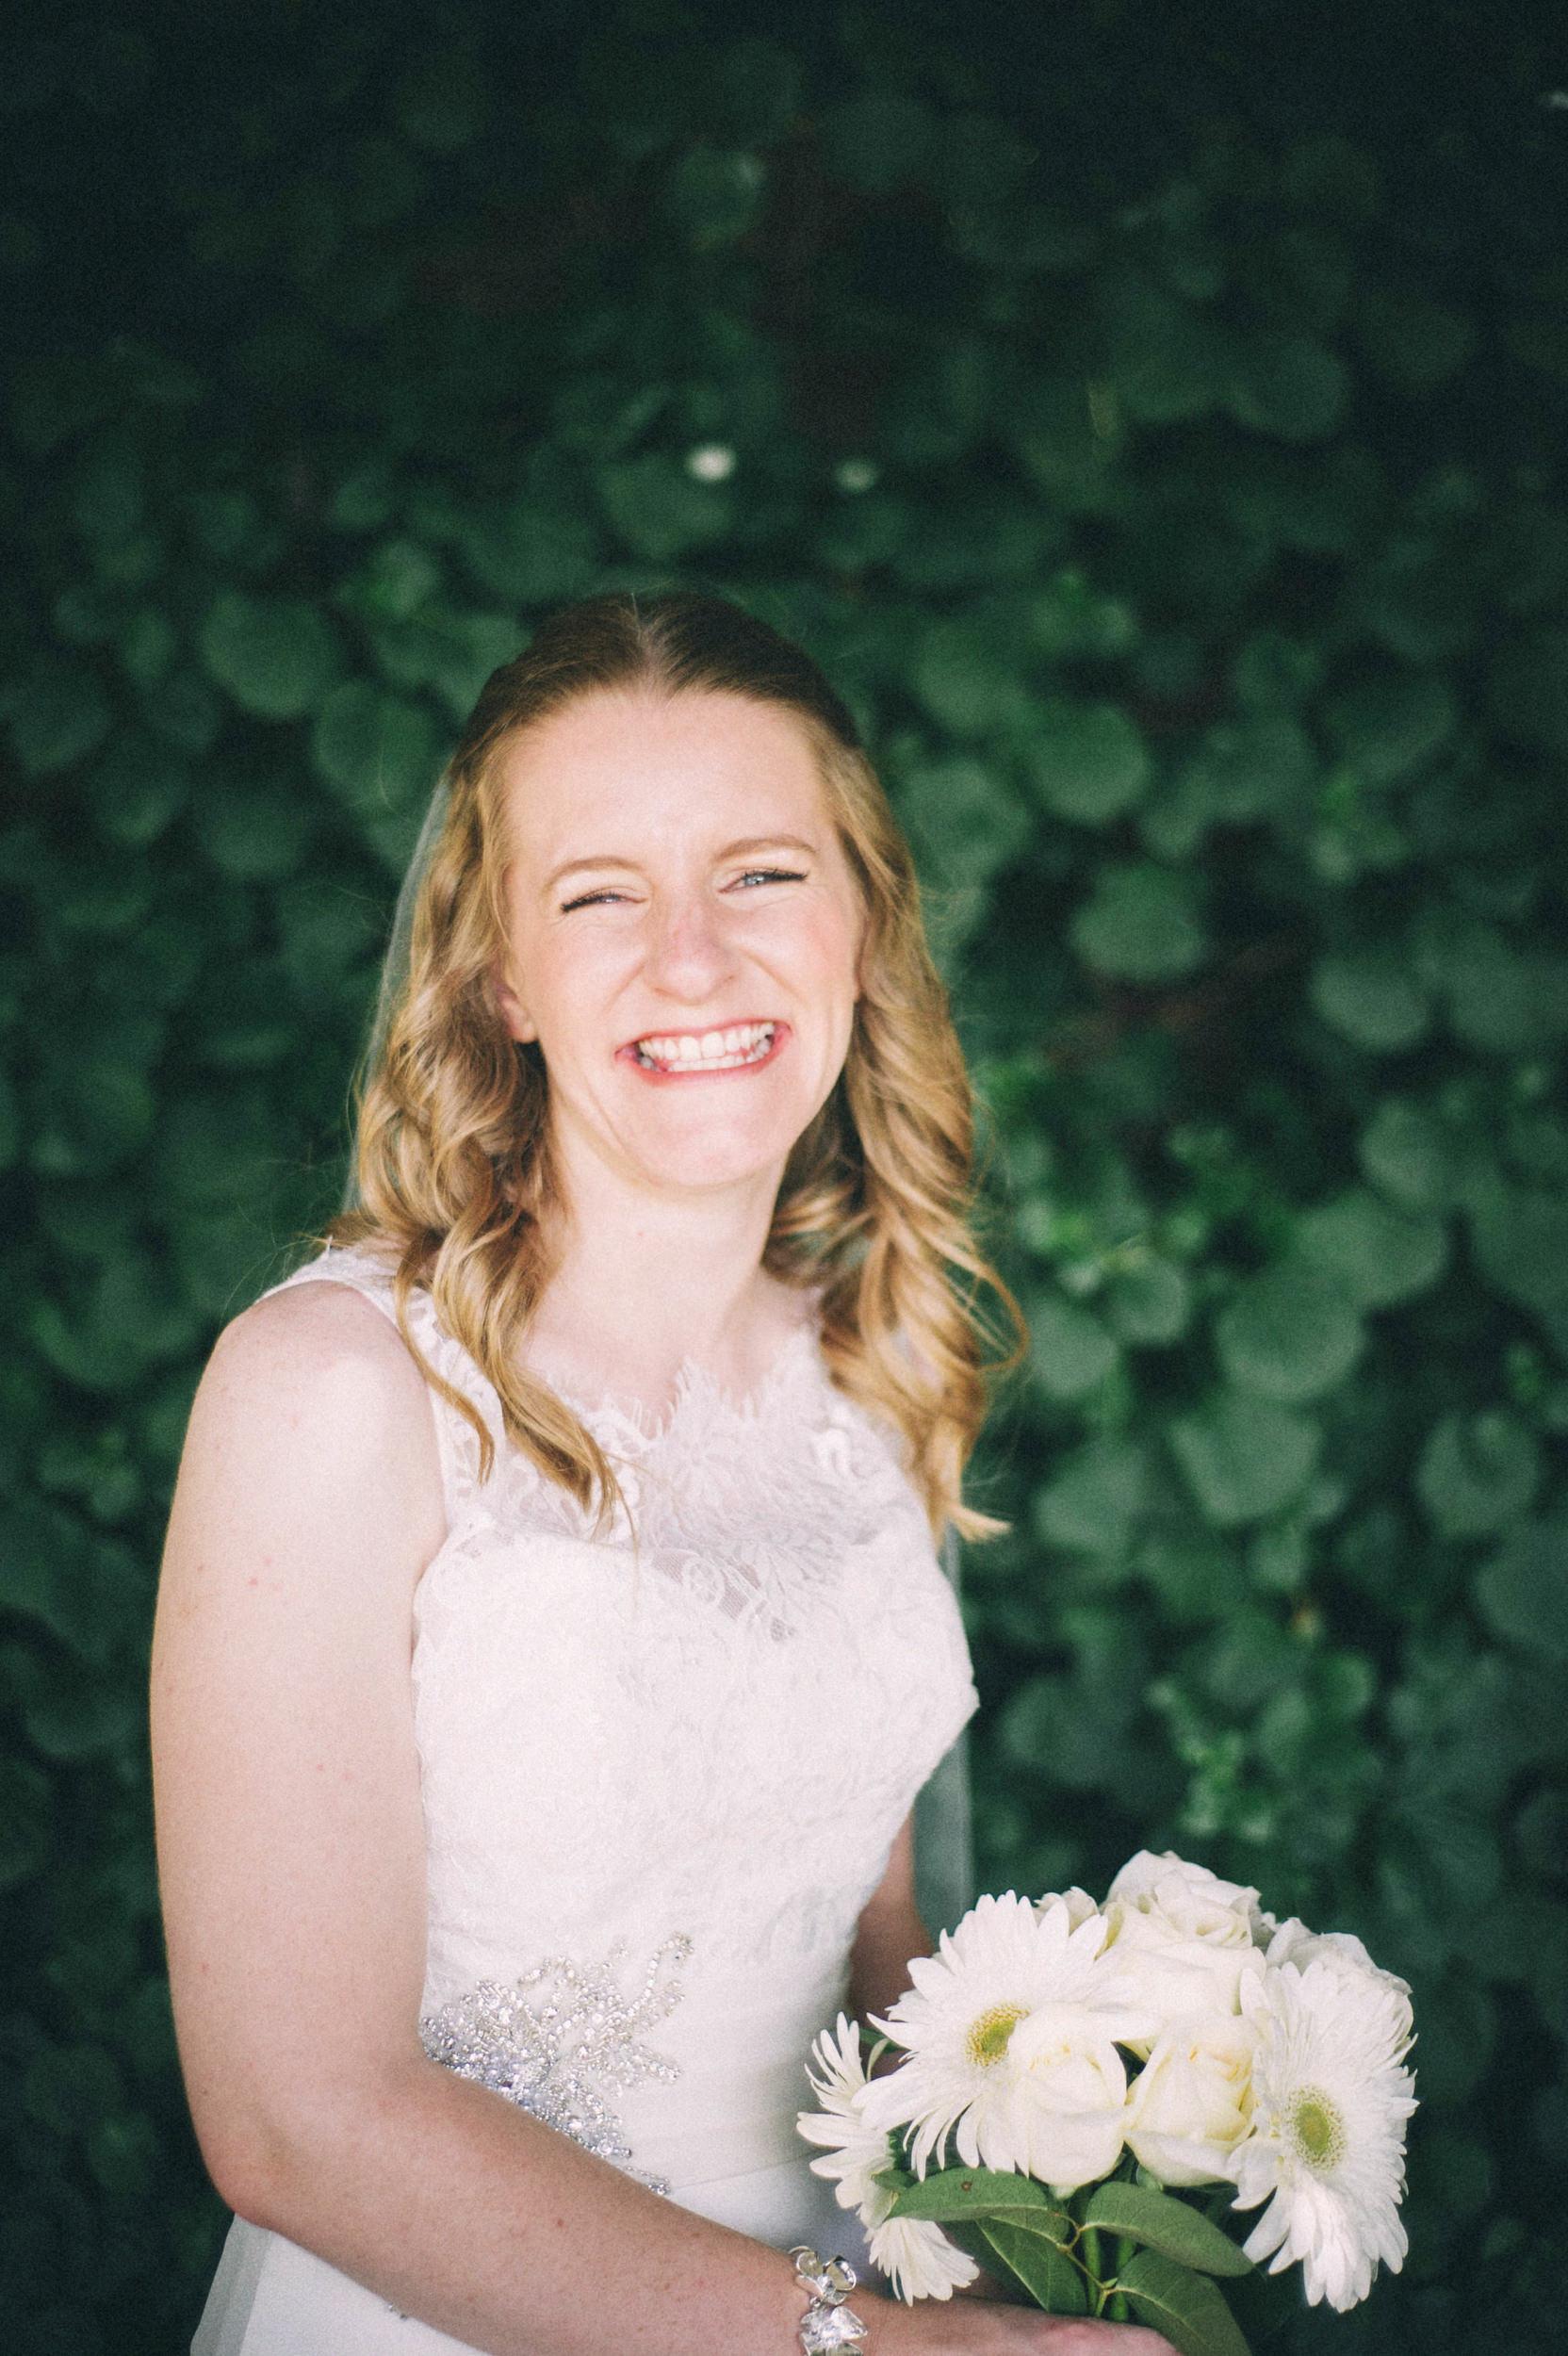 Jenna-Patrick-Garden-Court-Presbyterian-Seminary-Wedding-Louisville-Kentucky-Sarah-Katherine-Davis-Photography-40.jpg